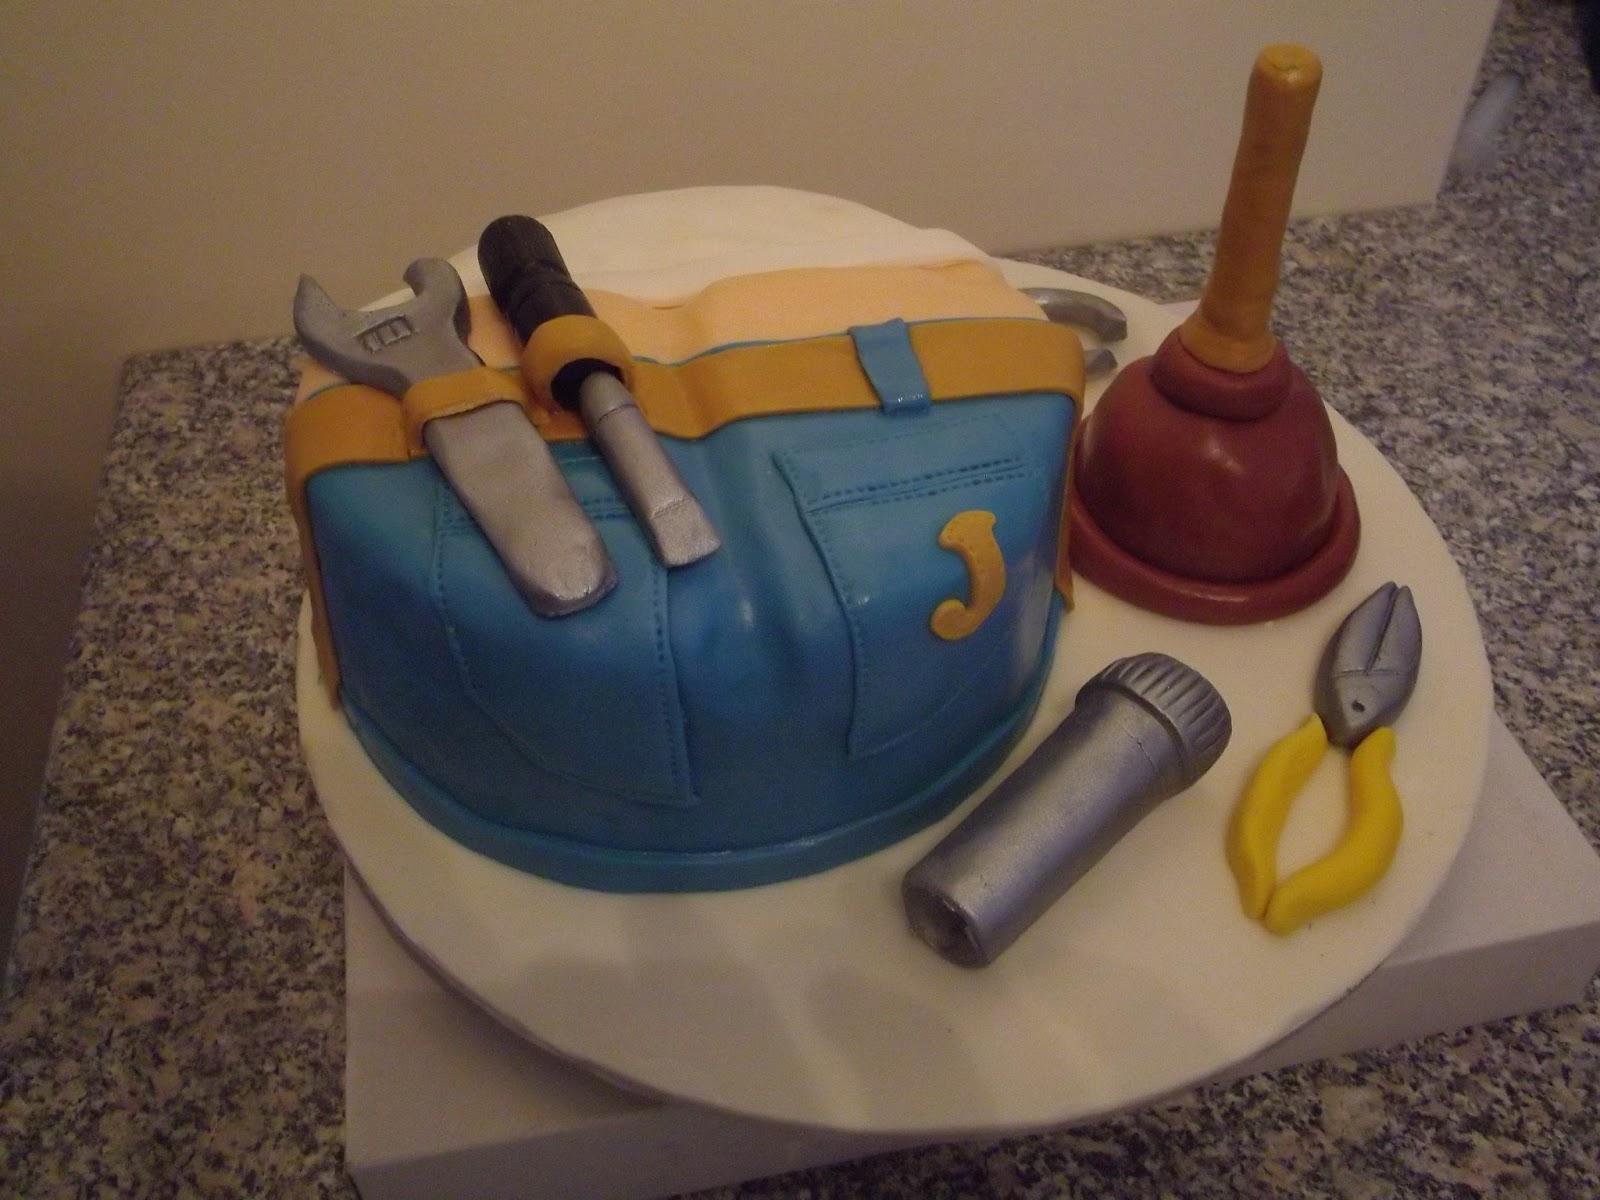 Plumber Cake On Pinterest Plumbing Toilet Cake And Google